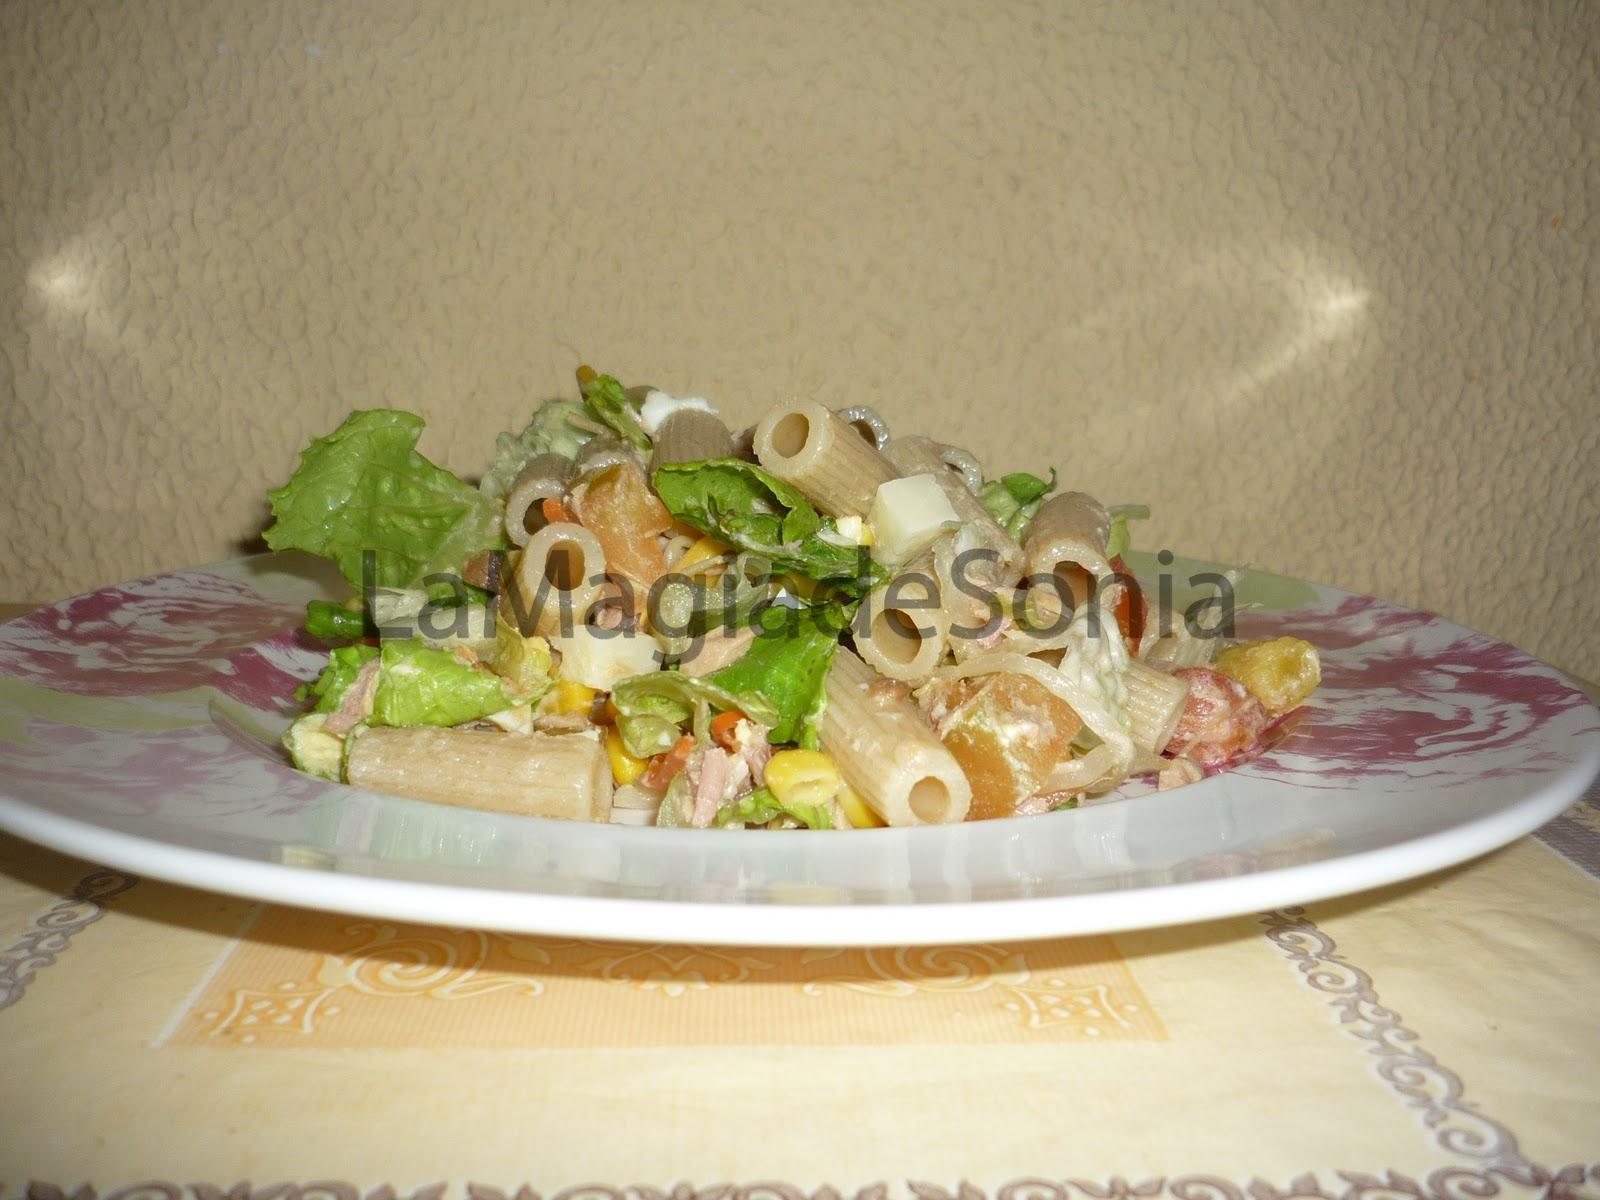 La magia de sonia ensalada de pasta integral rica en fibra for Ensalada de pasta integral